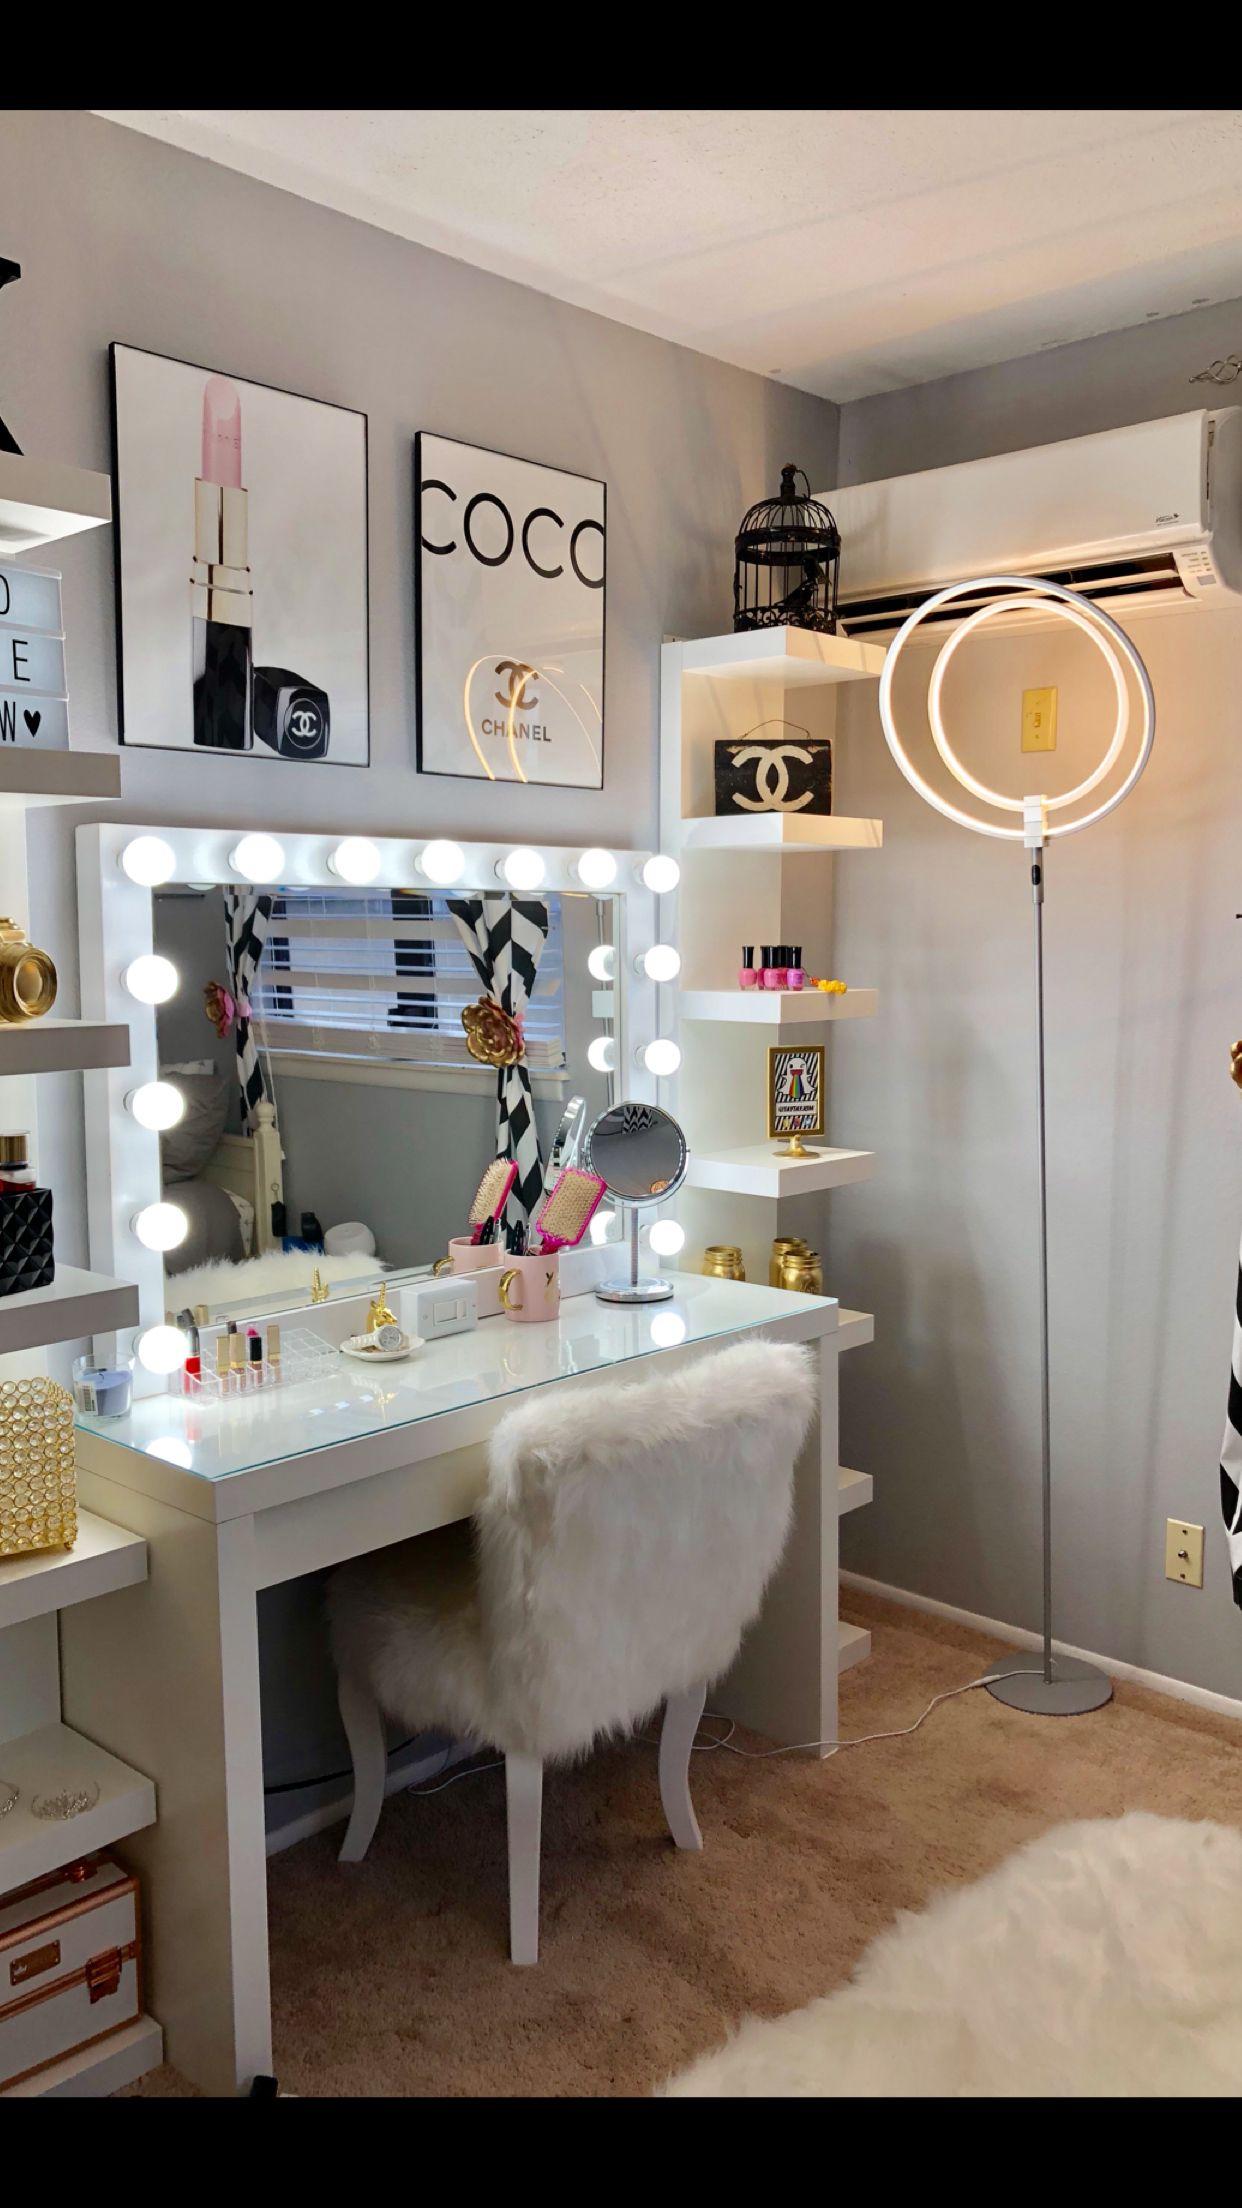 Chanel Inspired Room Bedroom Inspirations Fancy Bedroom Chanel